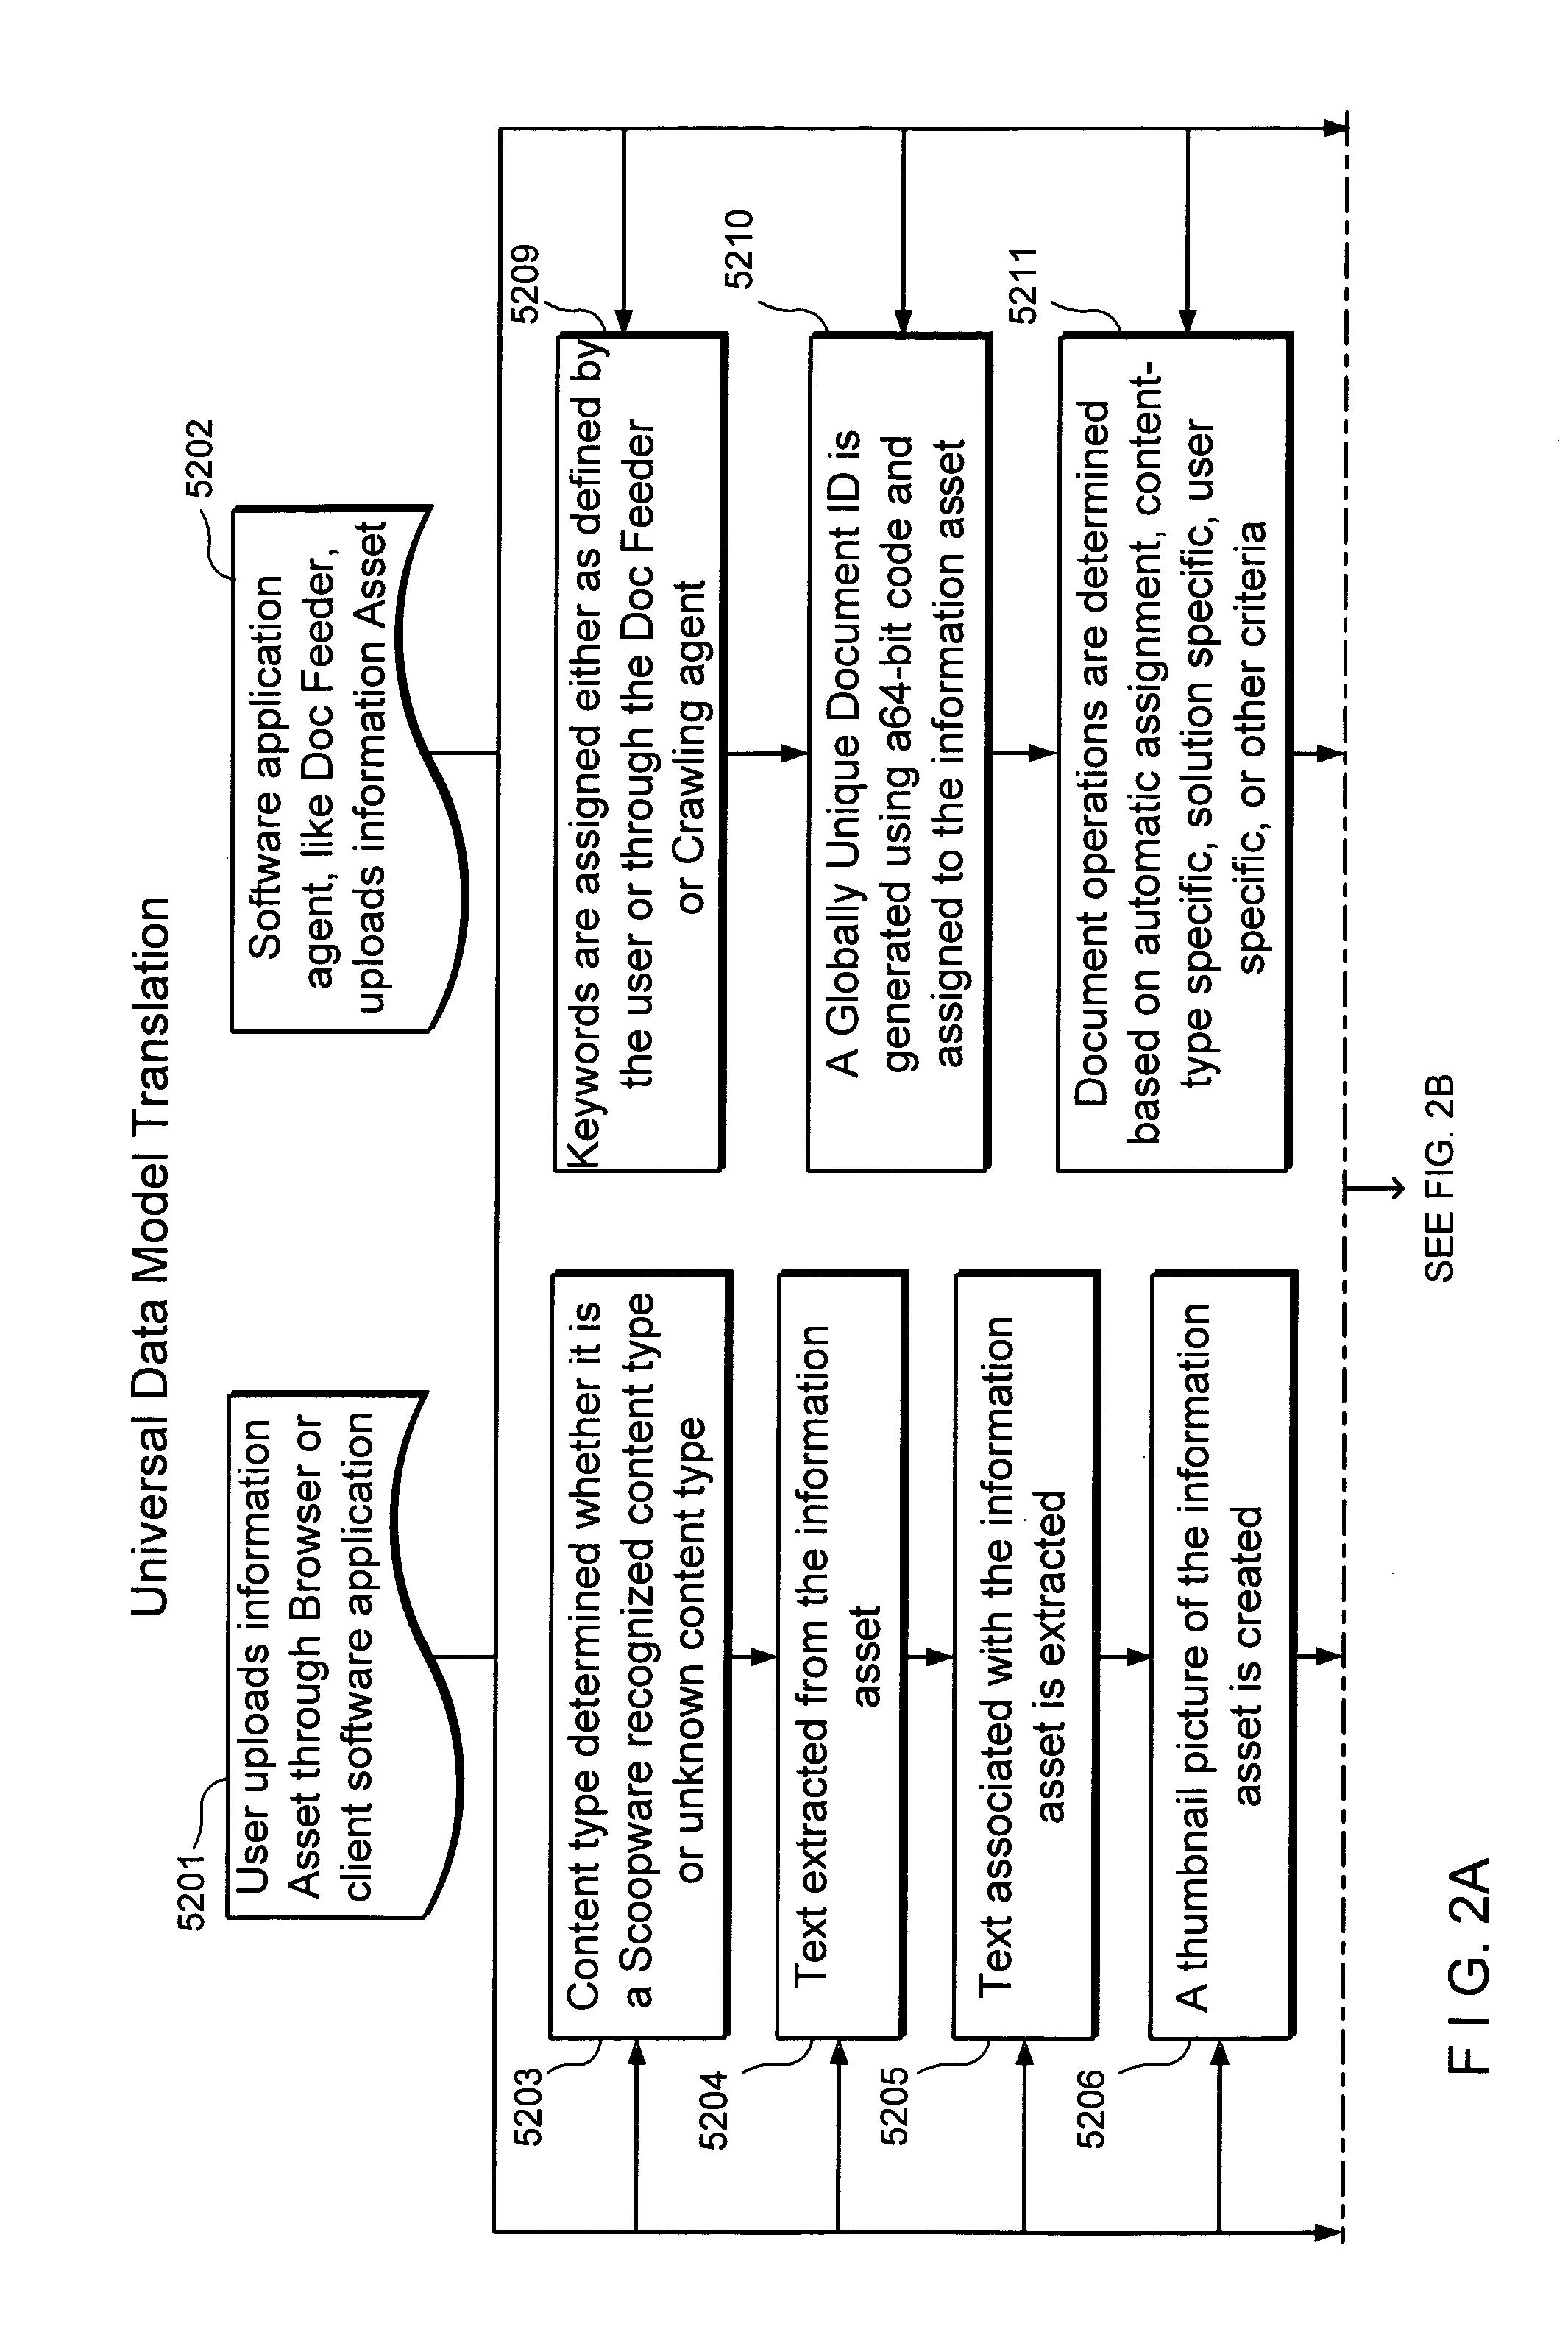 Patent US 7,865,538 B2